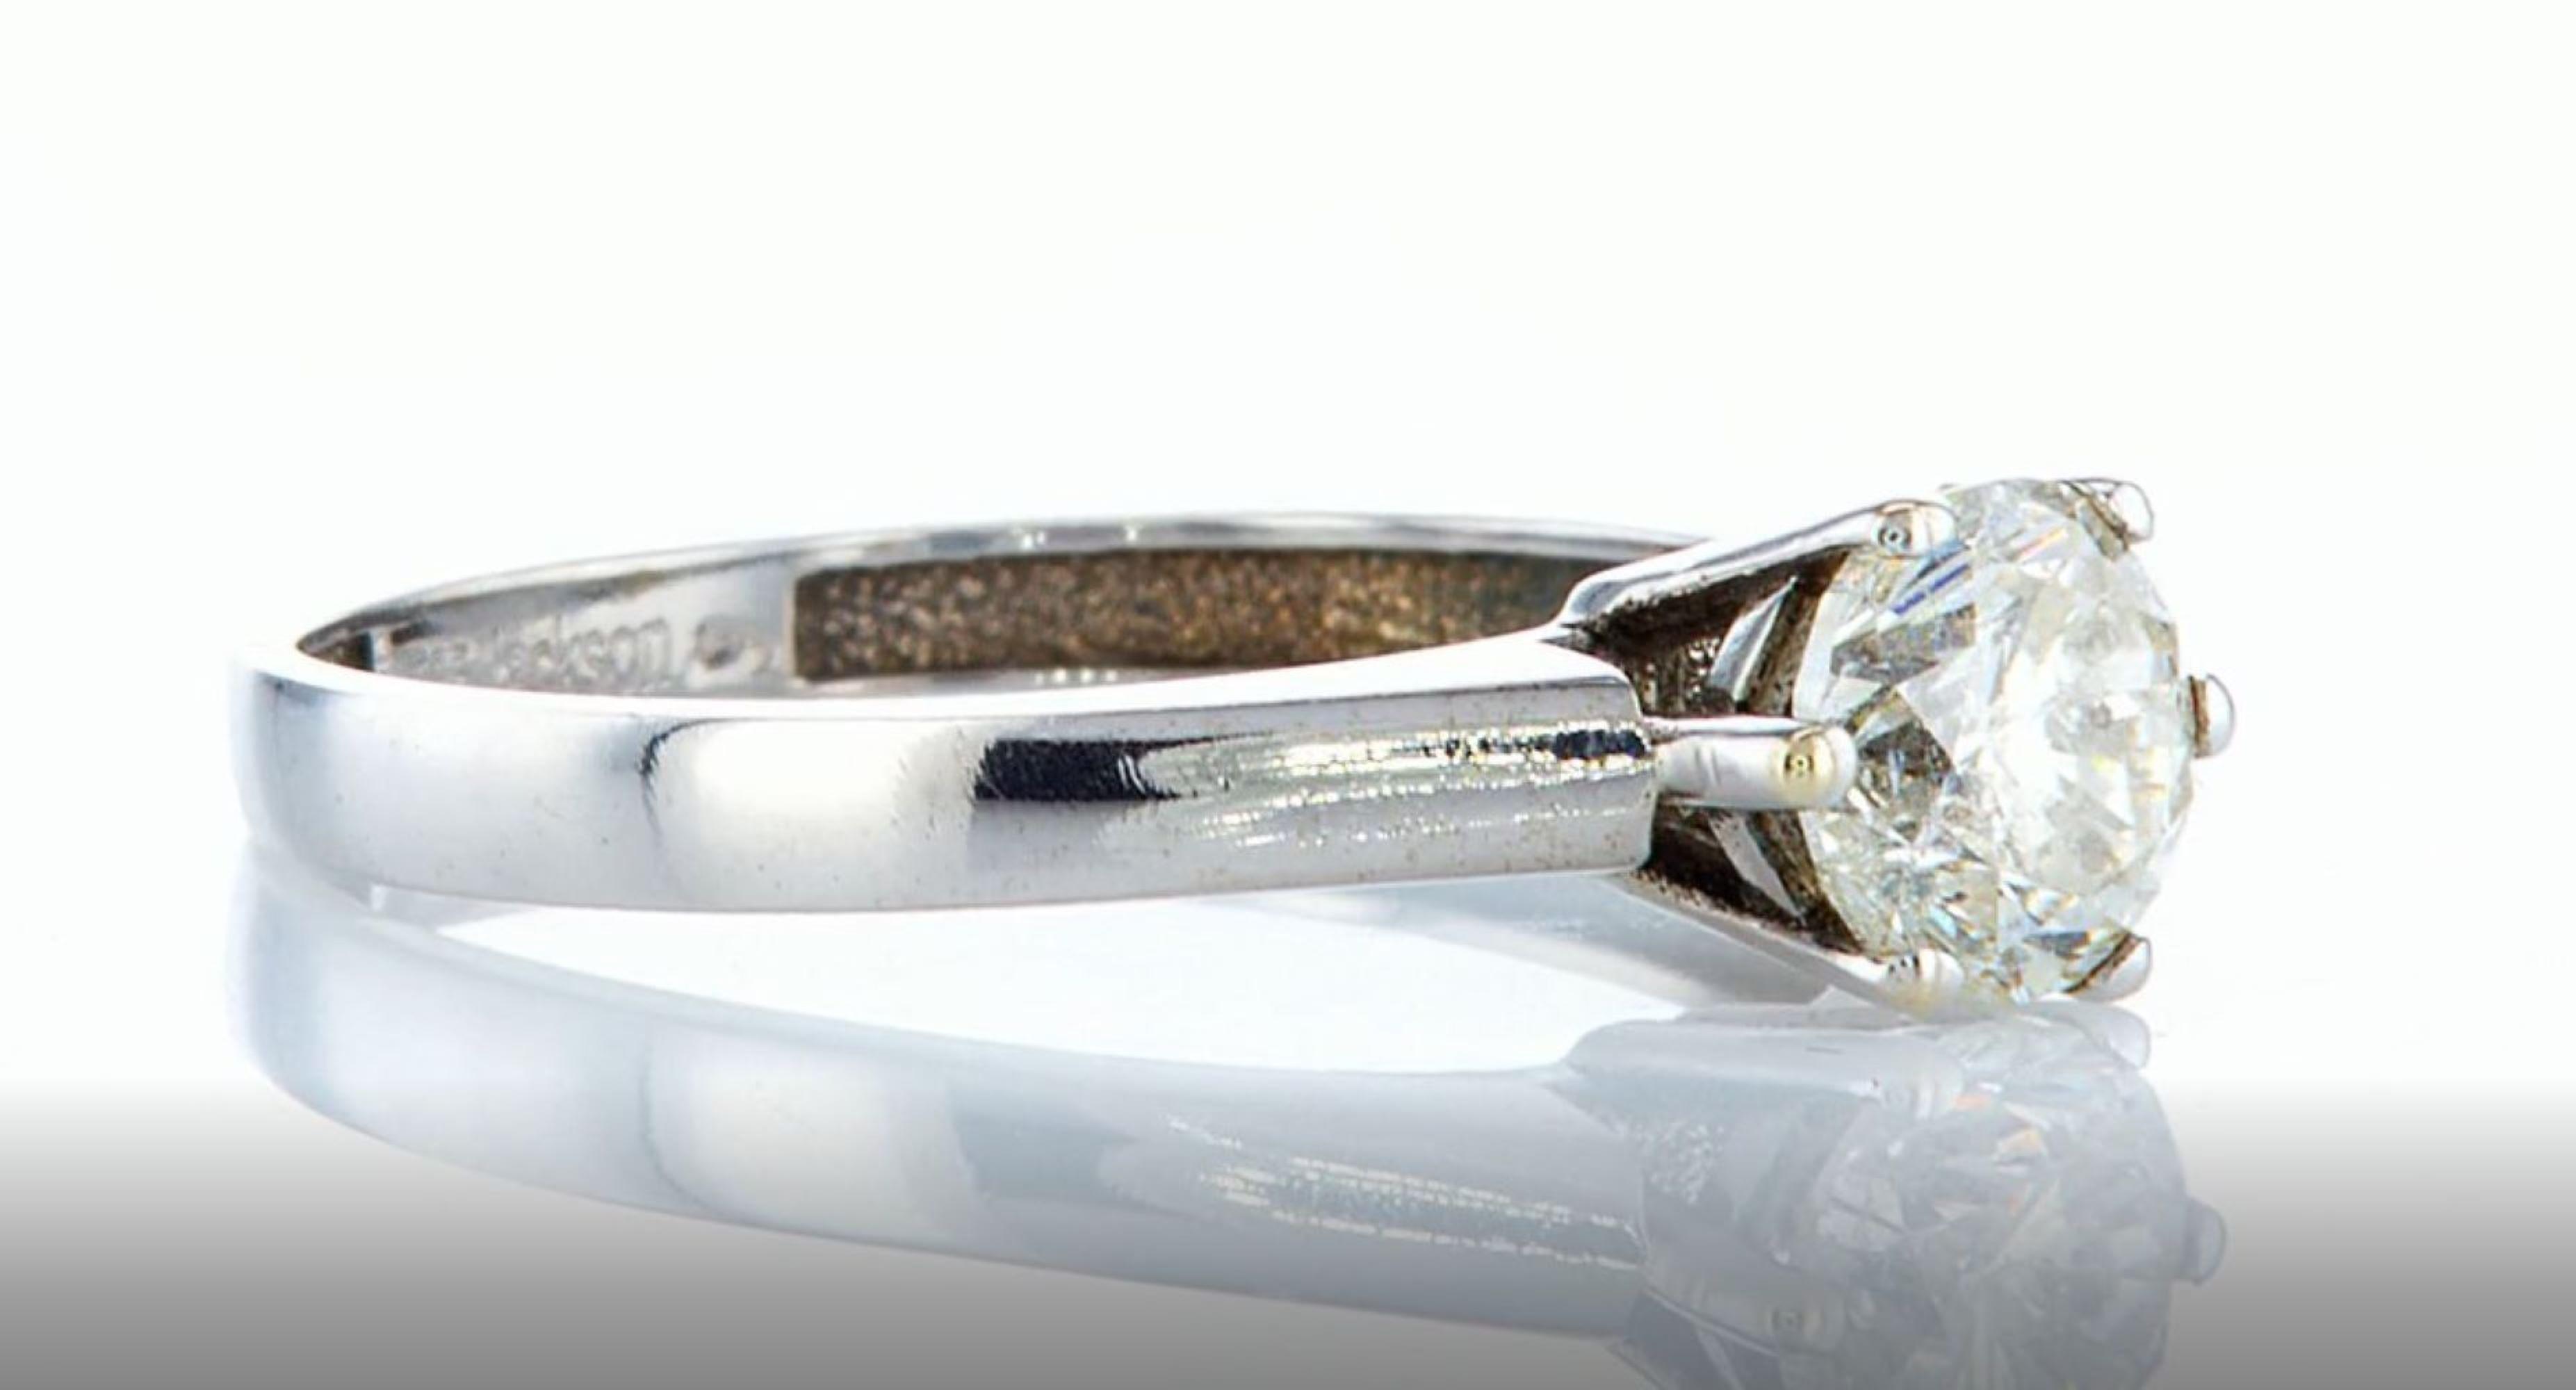 14K White gold ring 1.05CTW - Image 5 of 7